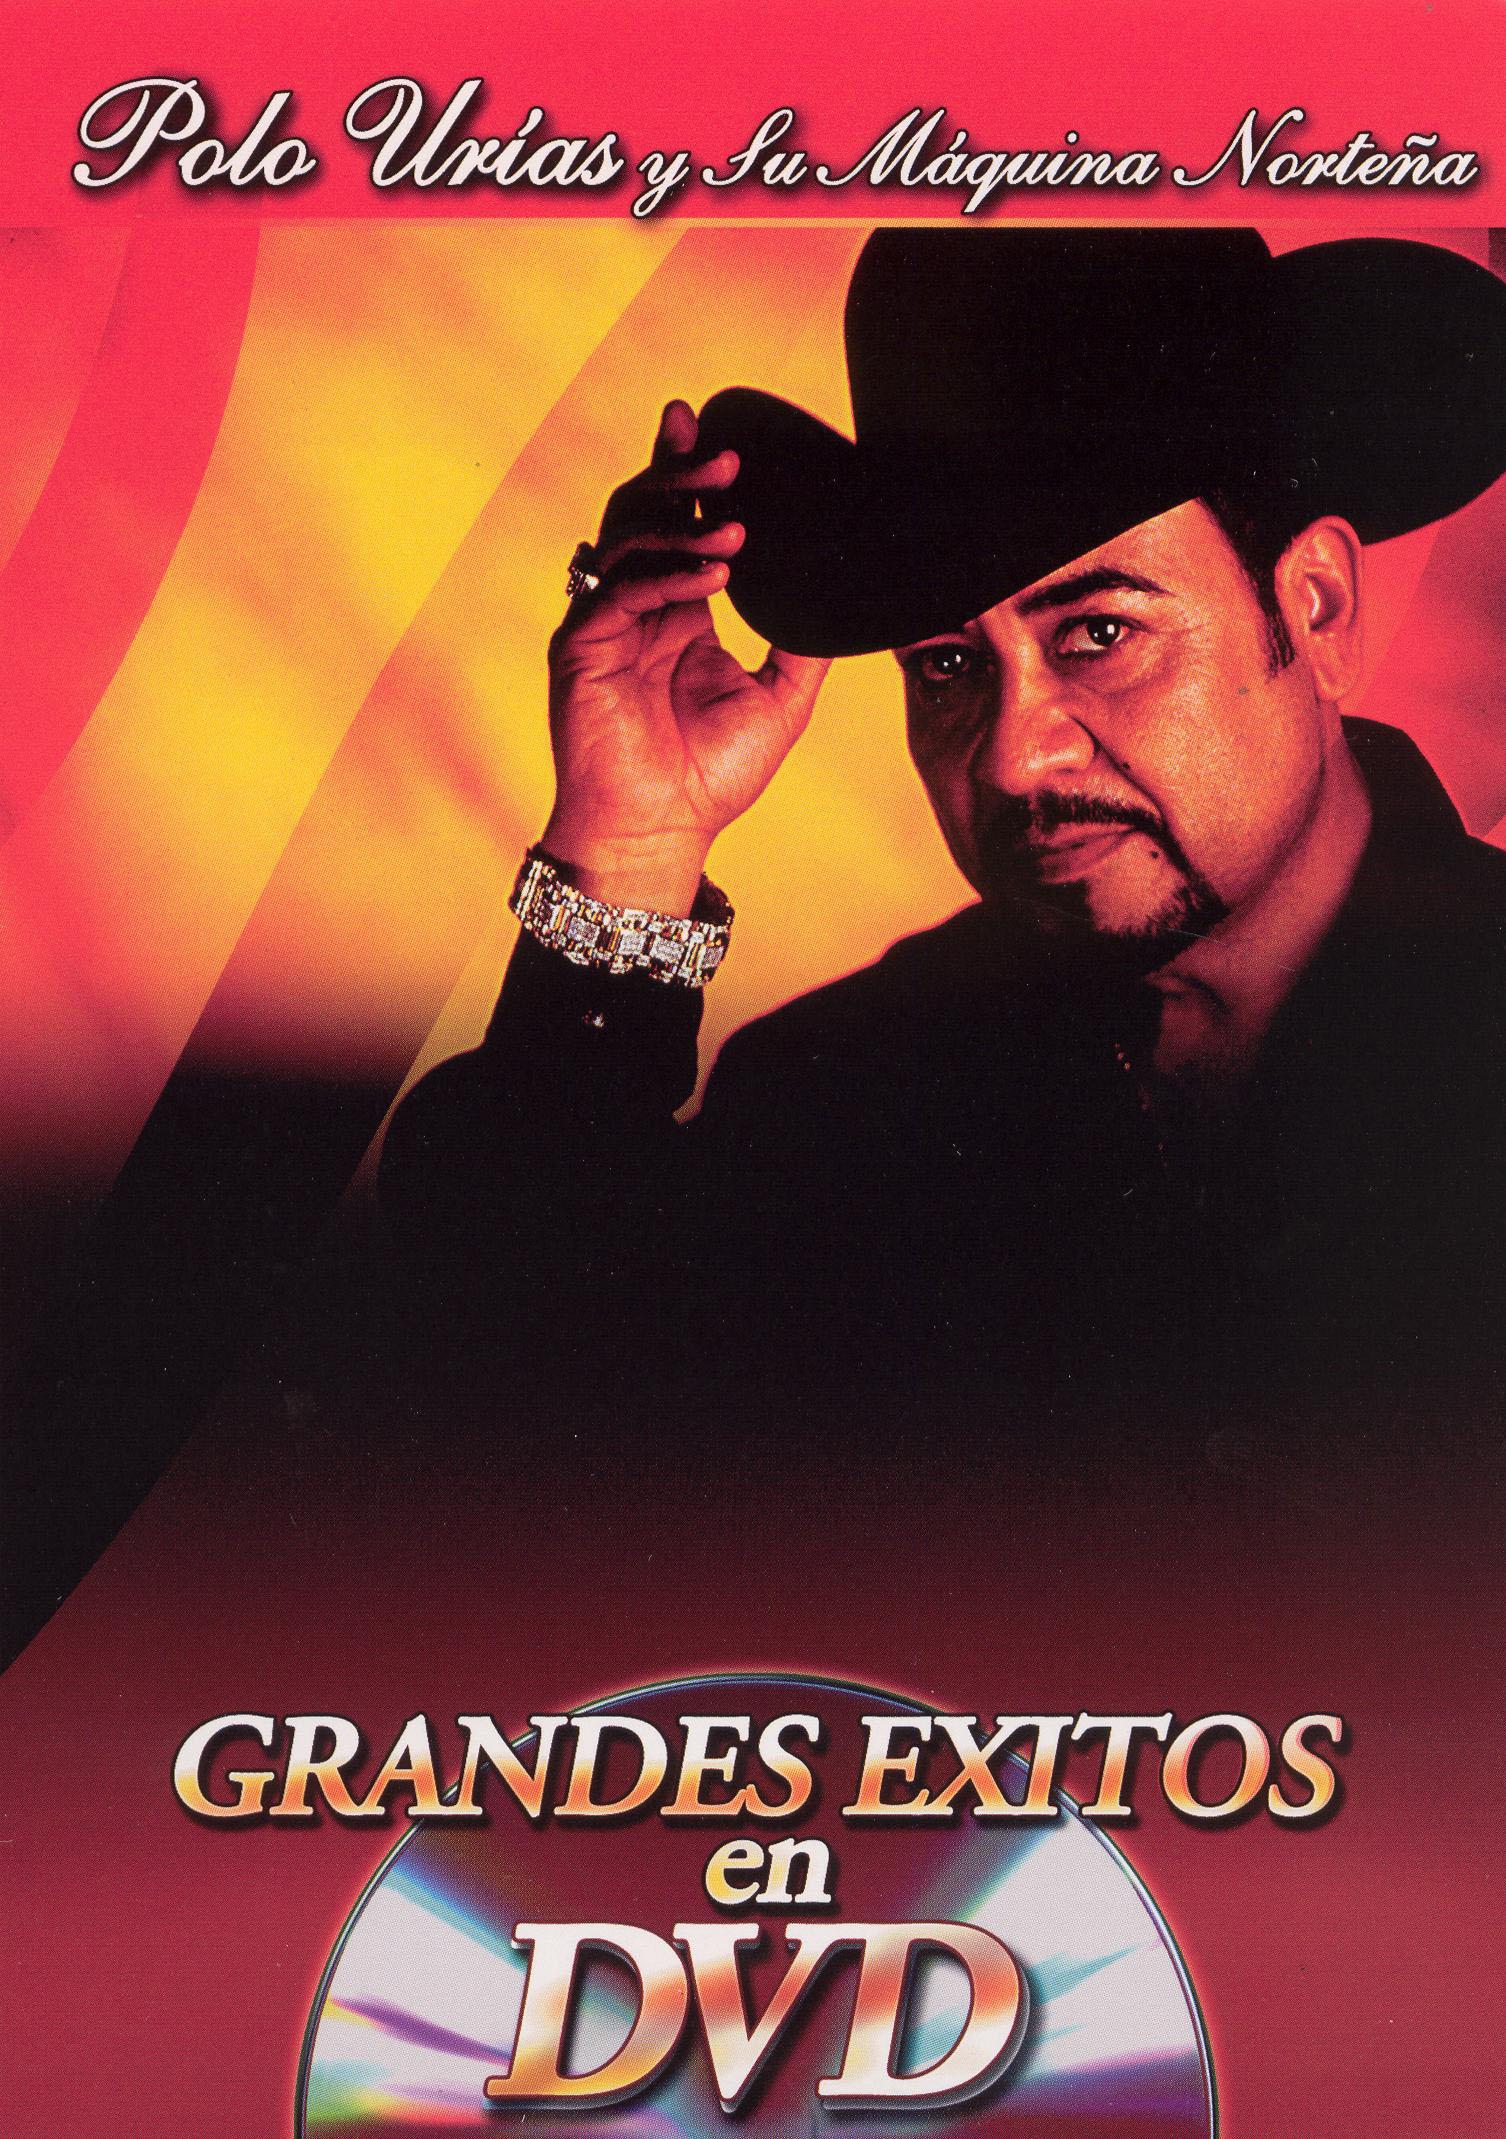 Polo Urias/Maquina Nortena: Grandes Exitos en DVD